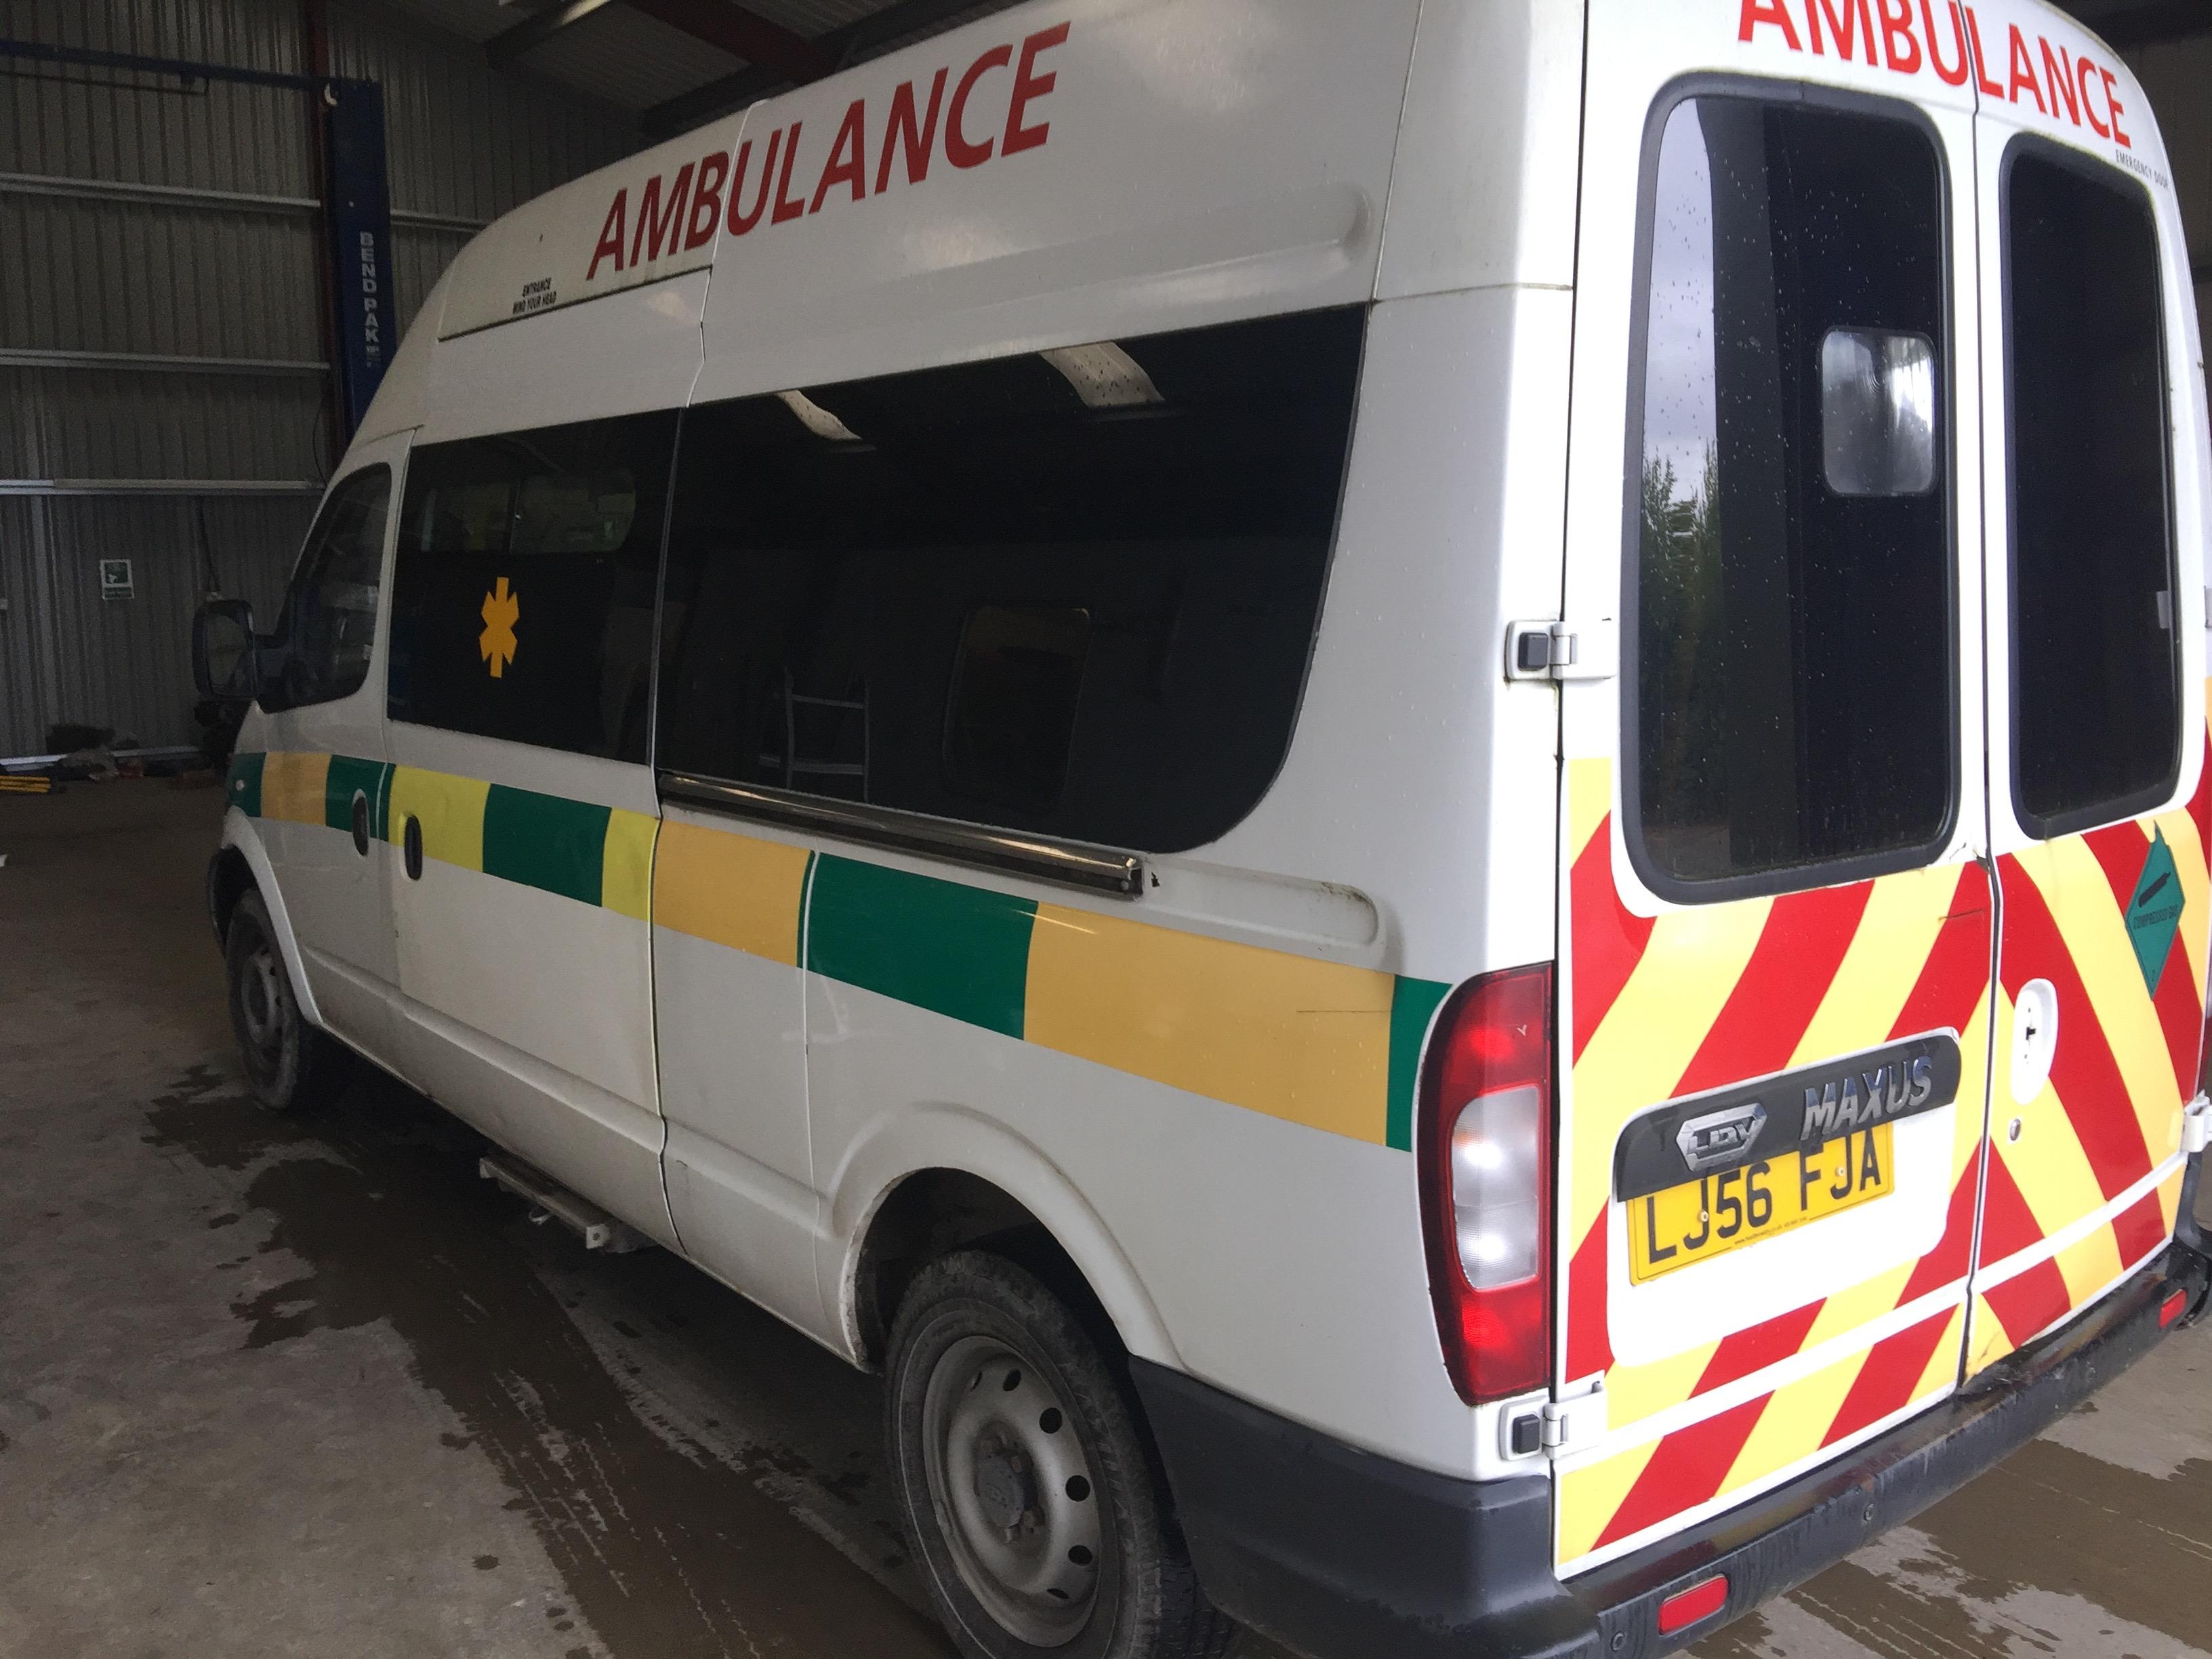 Lot 9 - LDV Maxus standard body patient transfer ambulance Registration No LJ56 FJA, 970587 recorded